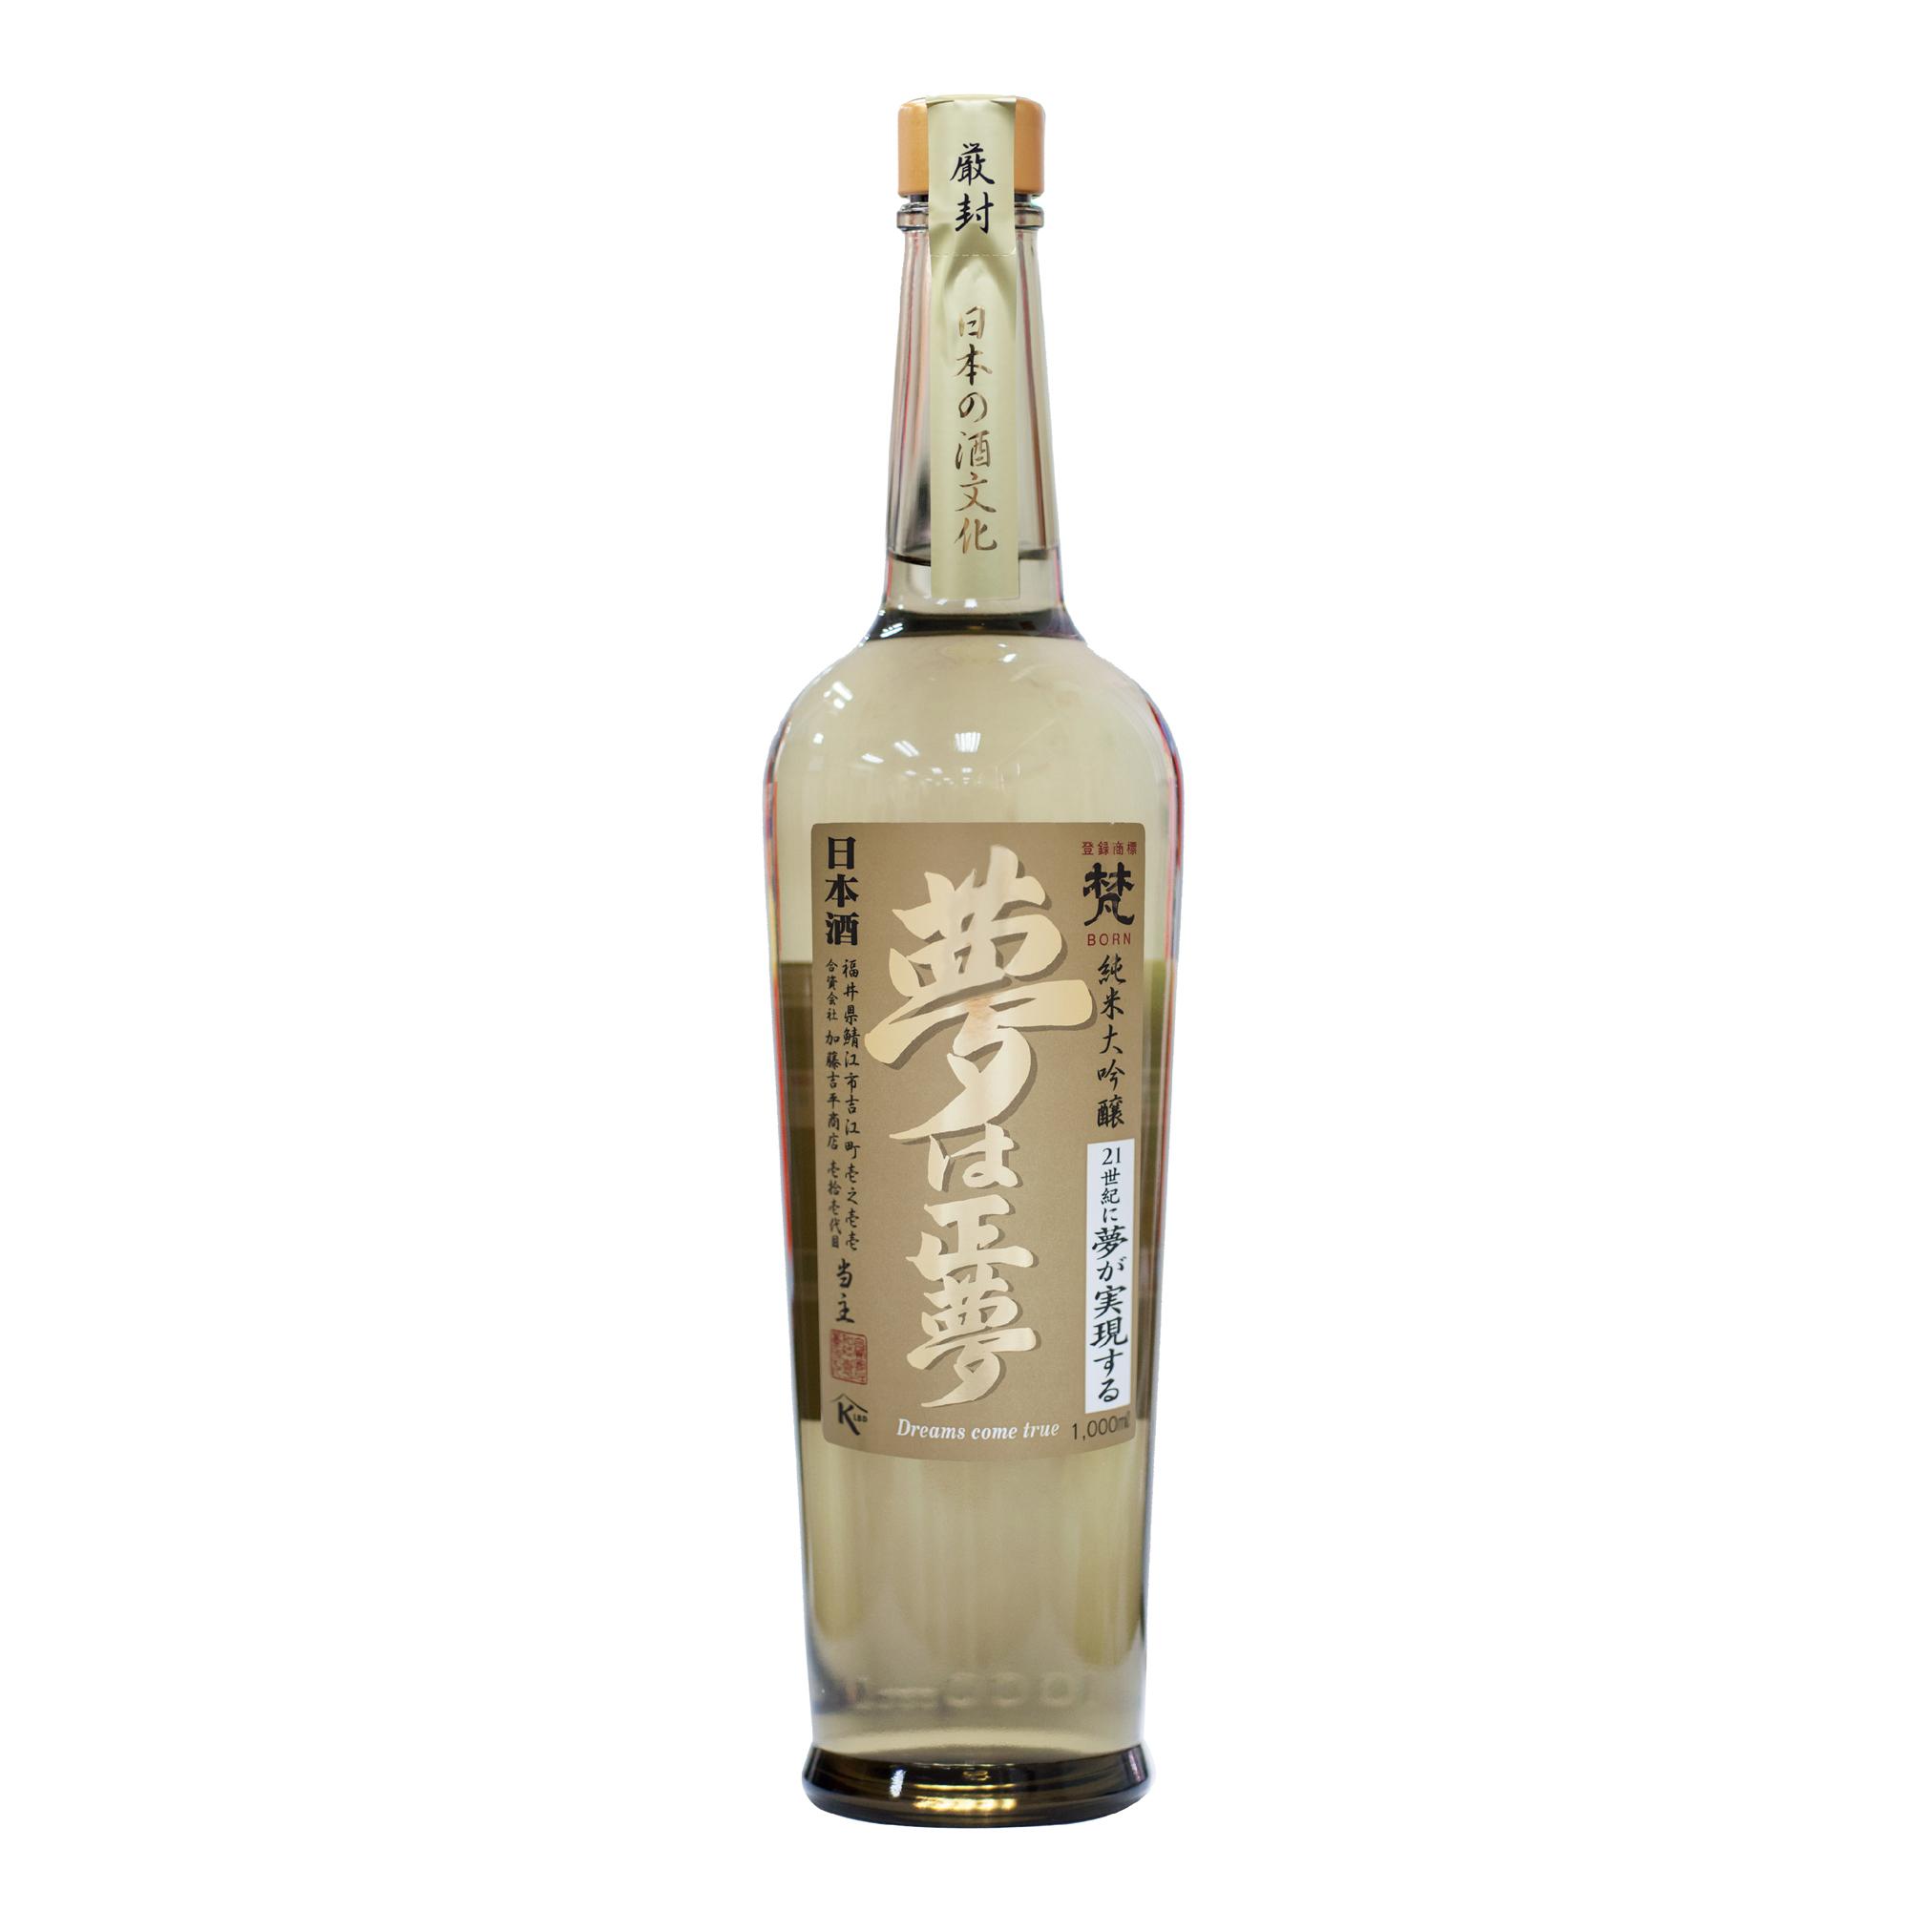 Born Yumehamasayume Junmai Daiginjo 16% 1000ml